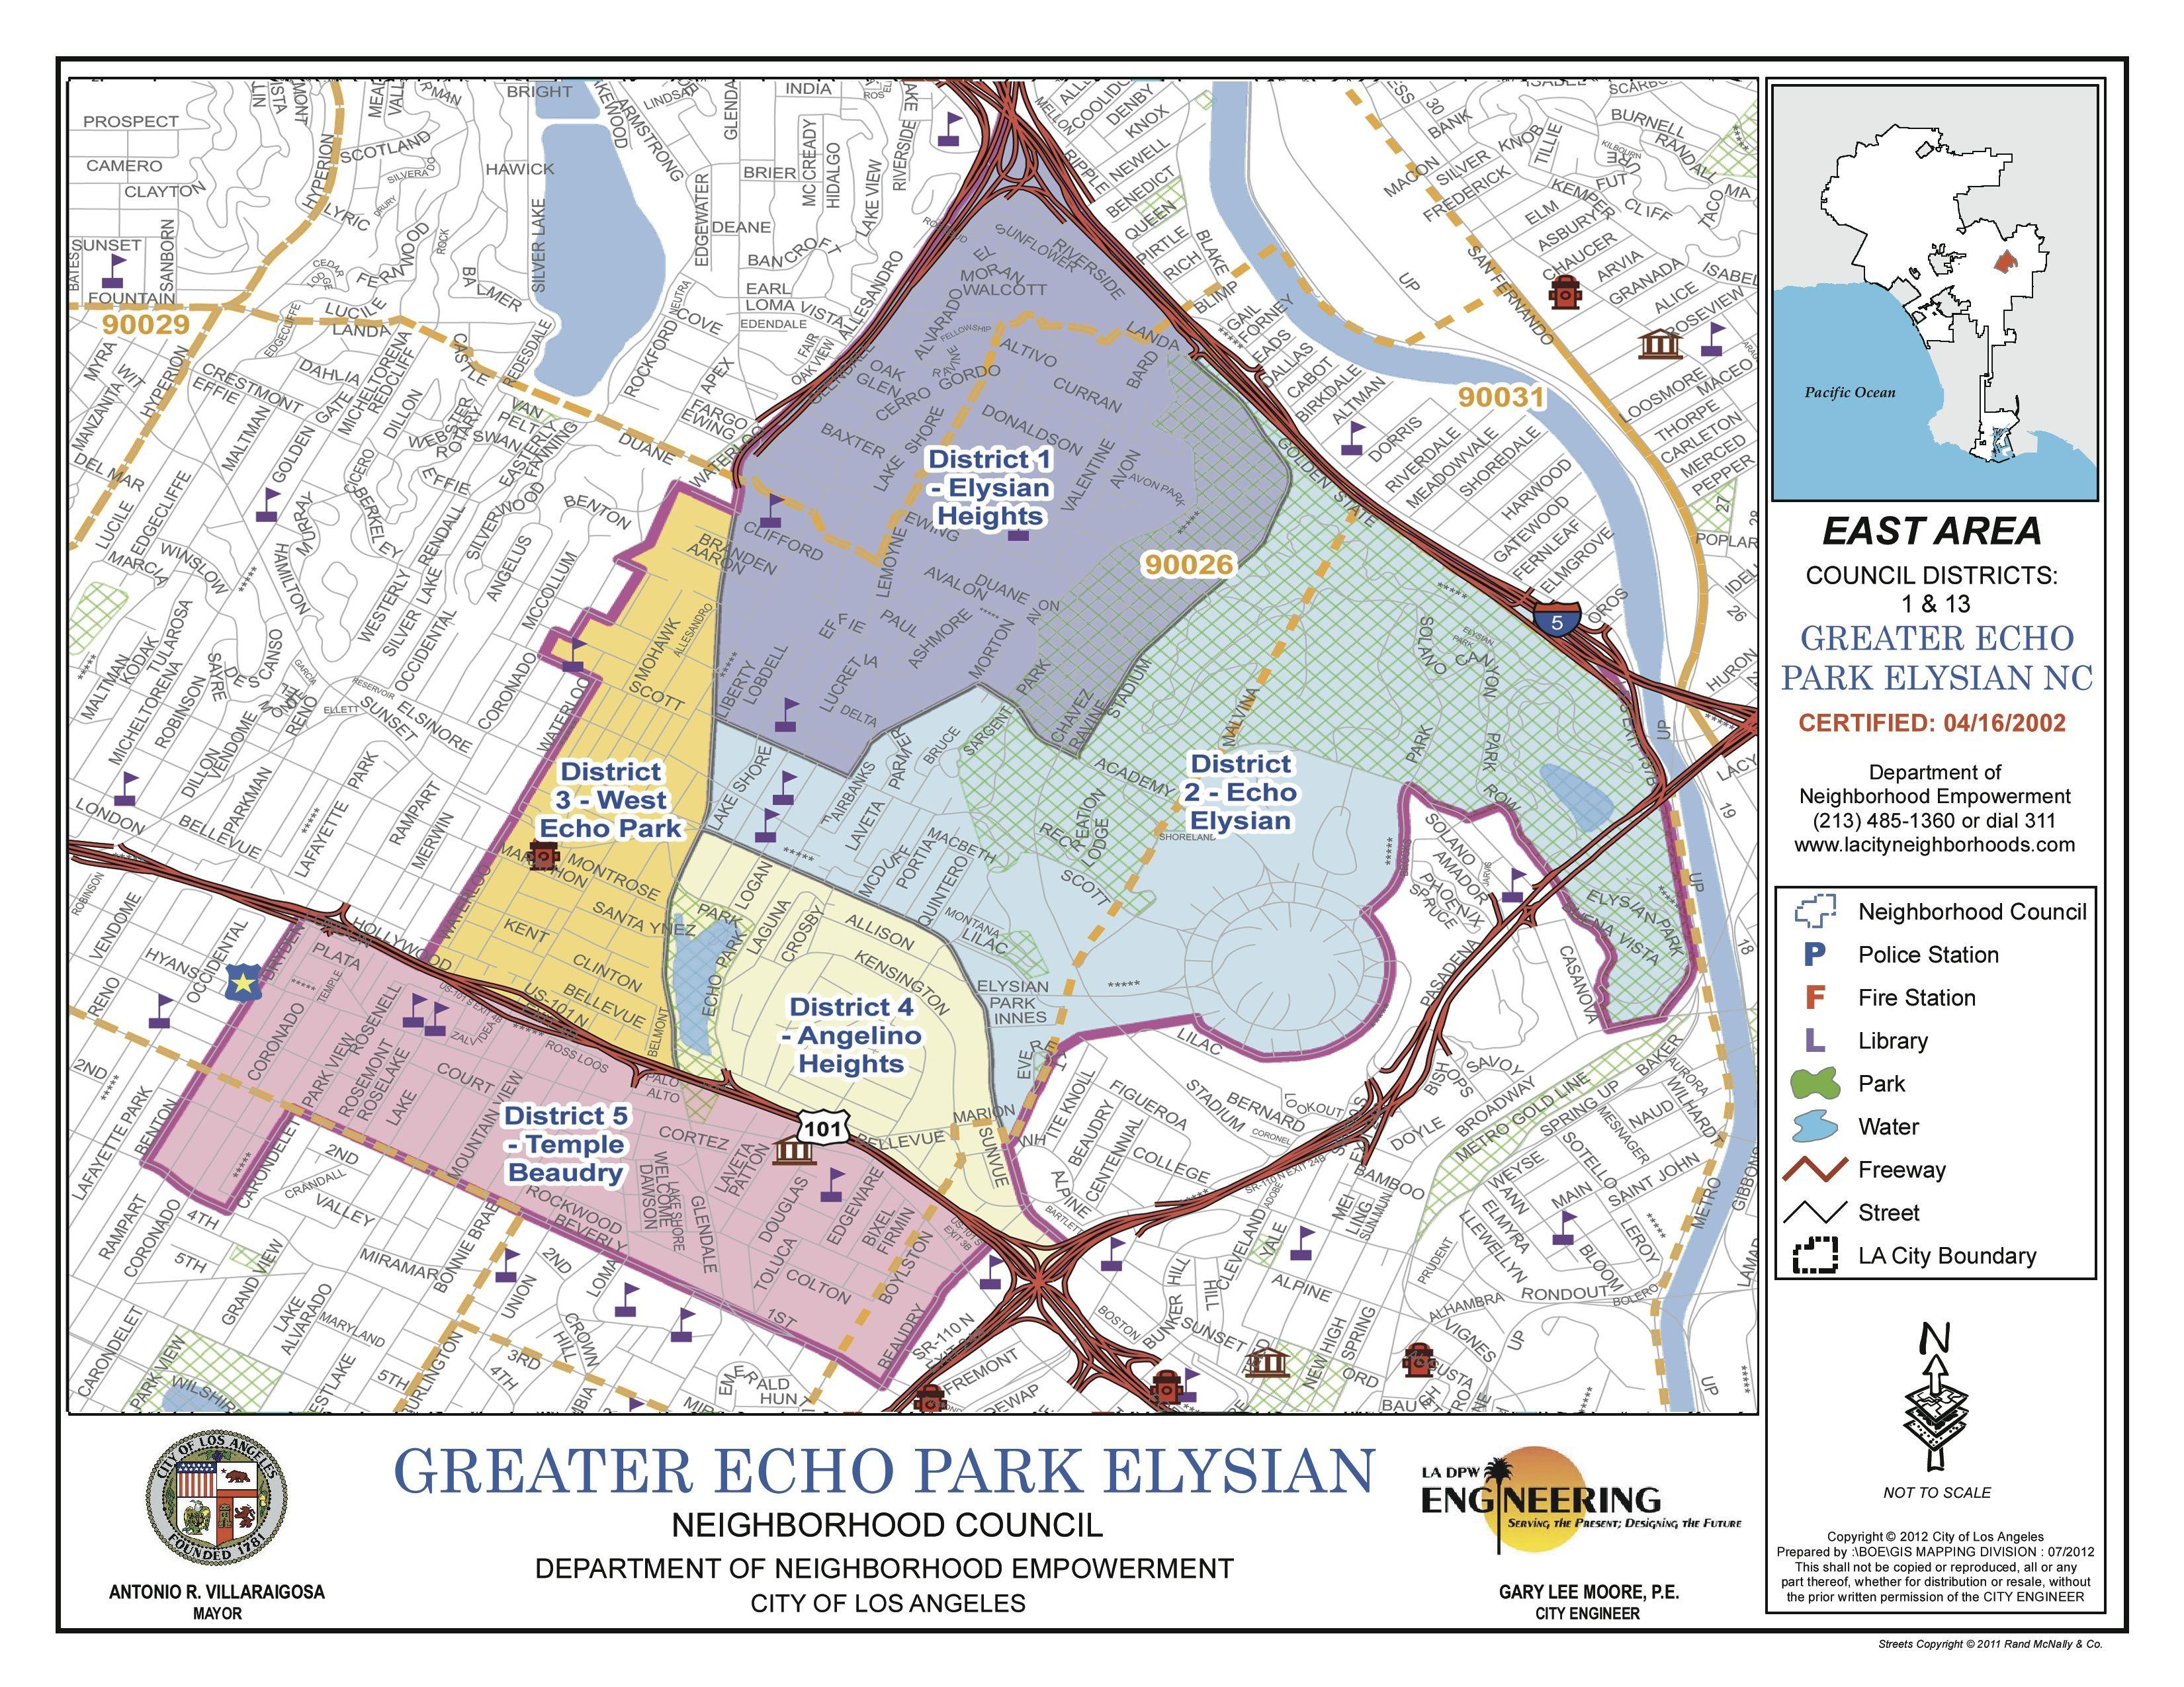 Elysian Park Map GREATER ECHO PARK ELYSIAN NEIGHBORHOOD COUNCIL